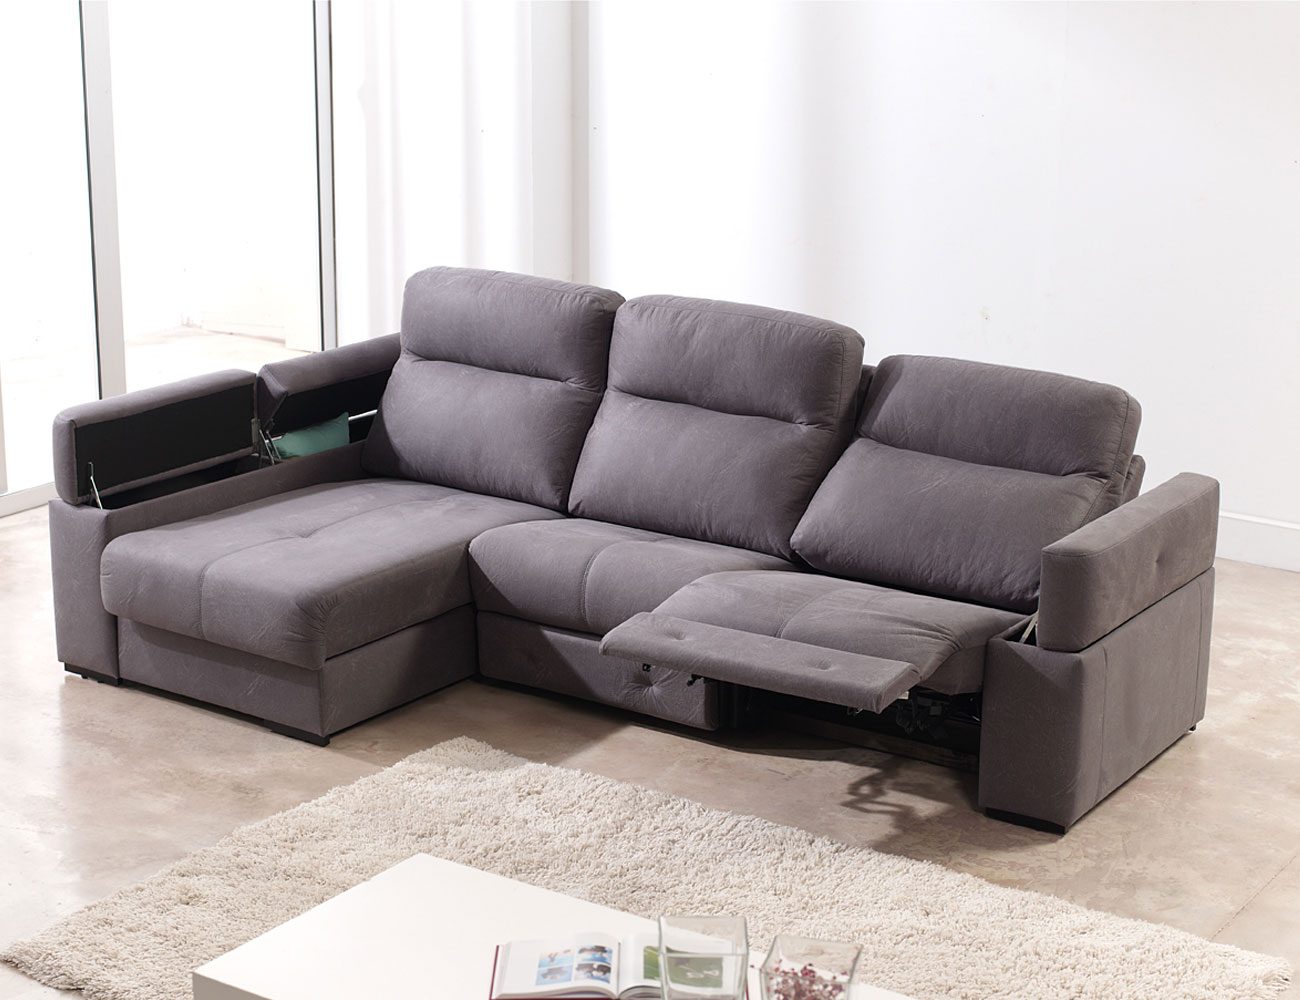 Sofa chaiselongue relax motor electrico 3 arcon 17